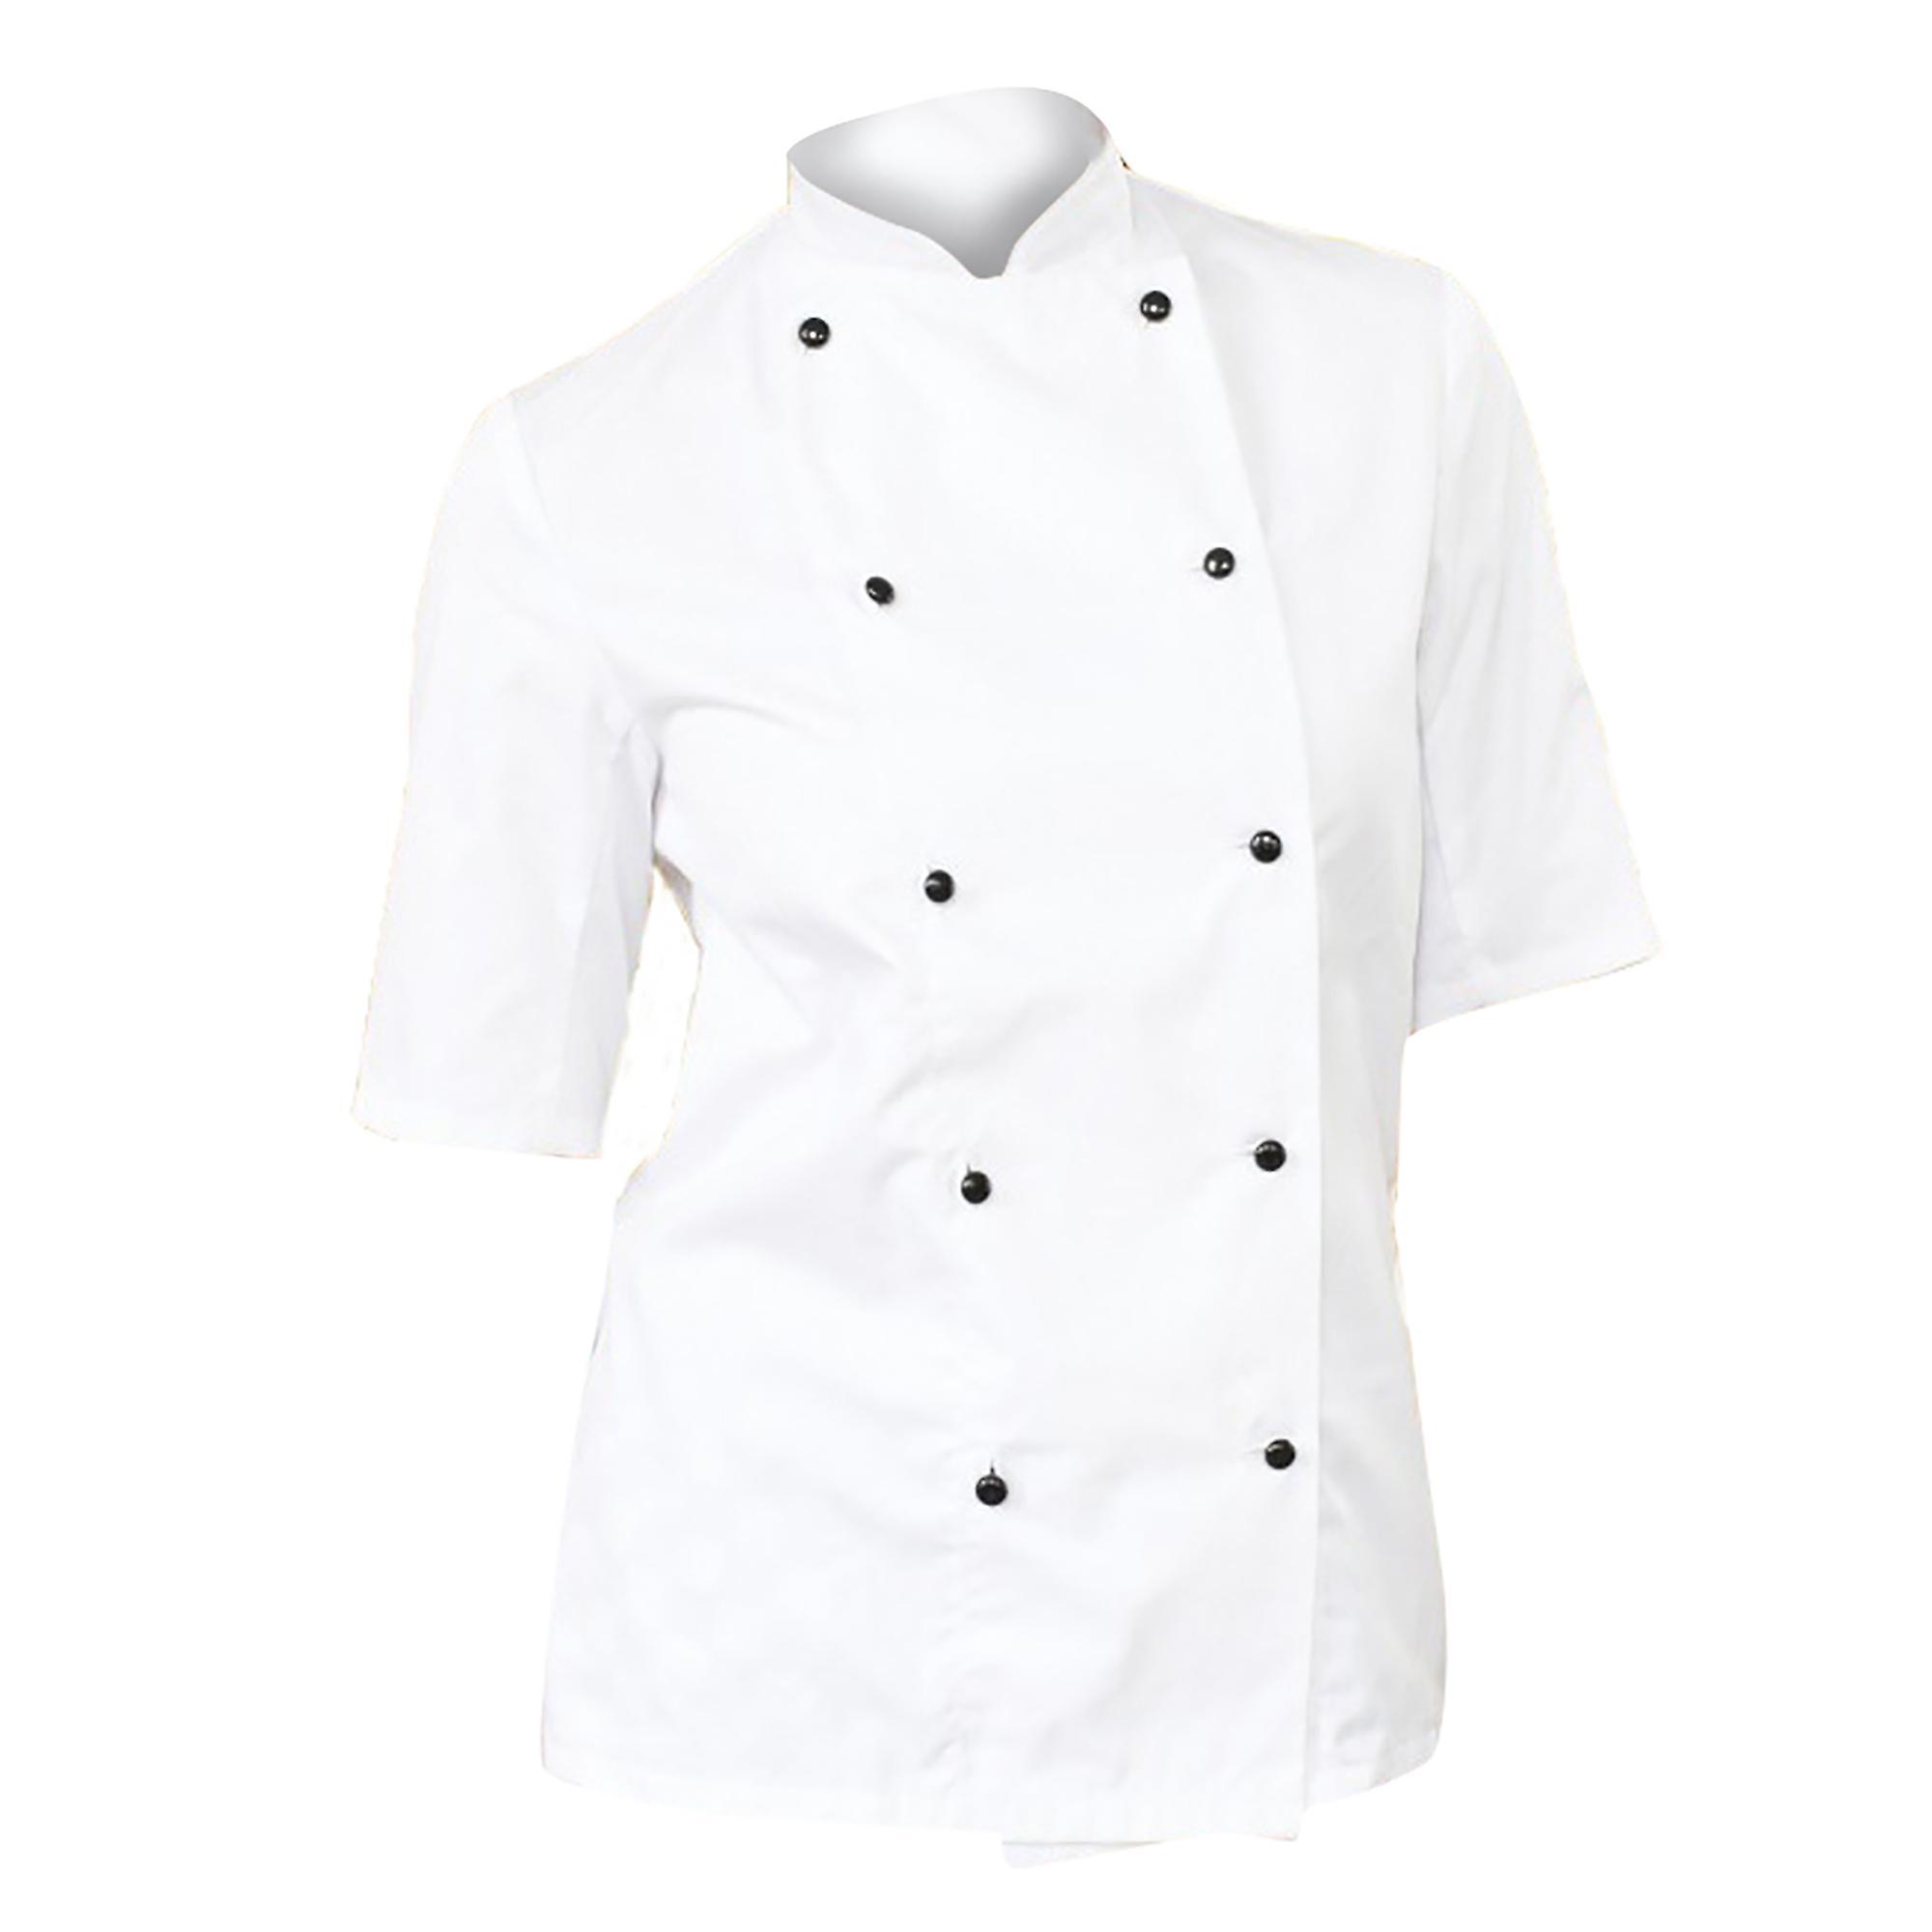 Dennys Womens/Ladies Lightweight Short Sleeve Chefs Jacket / Chefswear (Pack of 2)